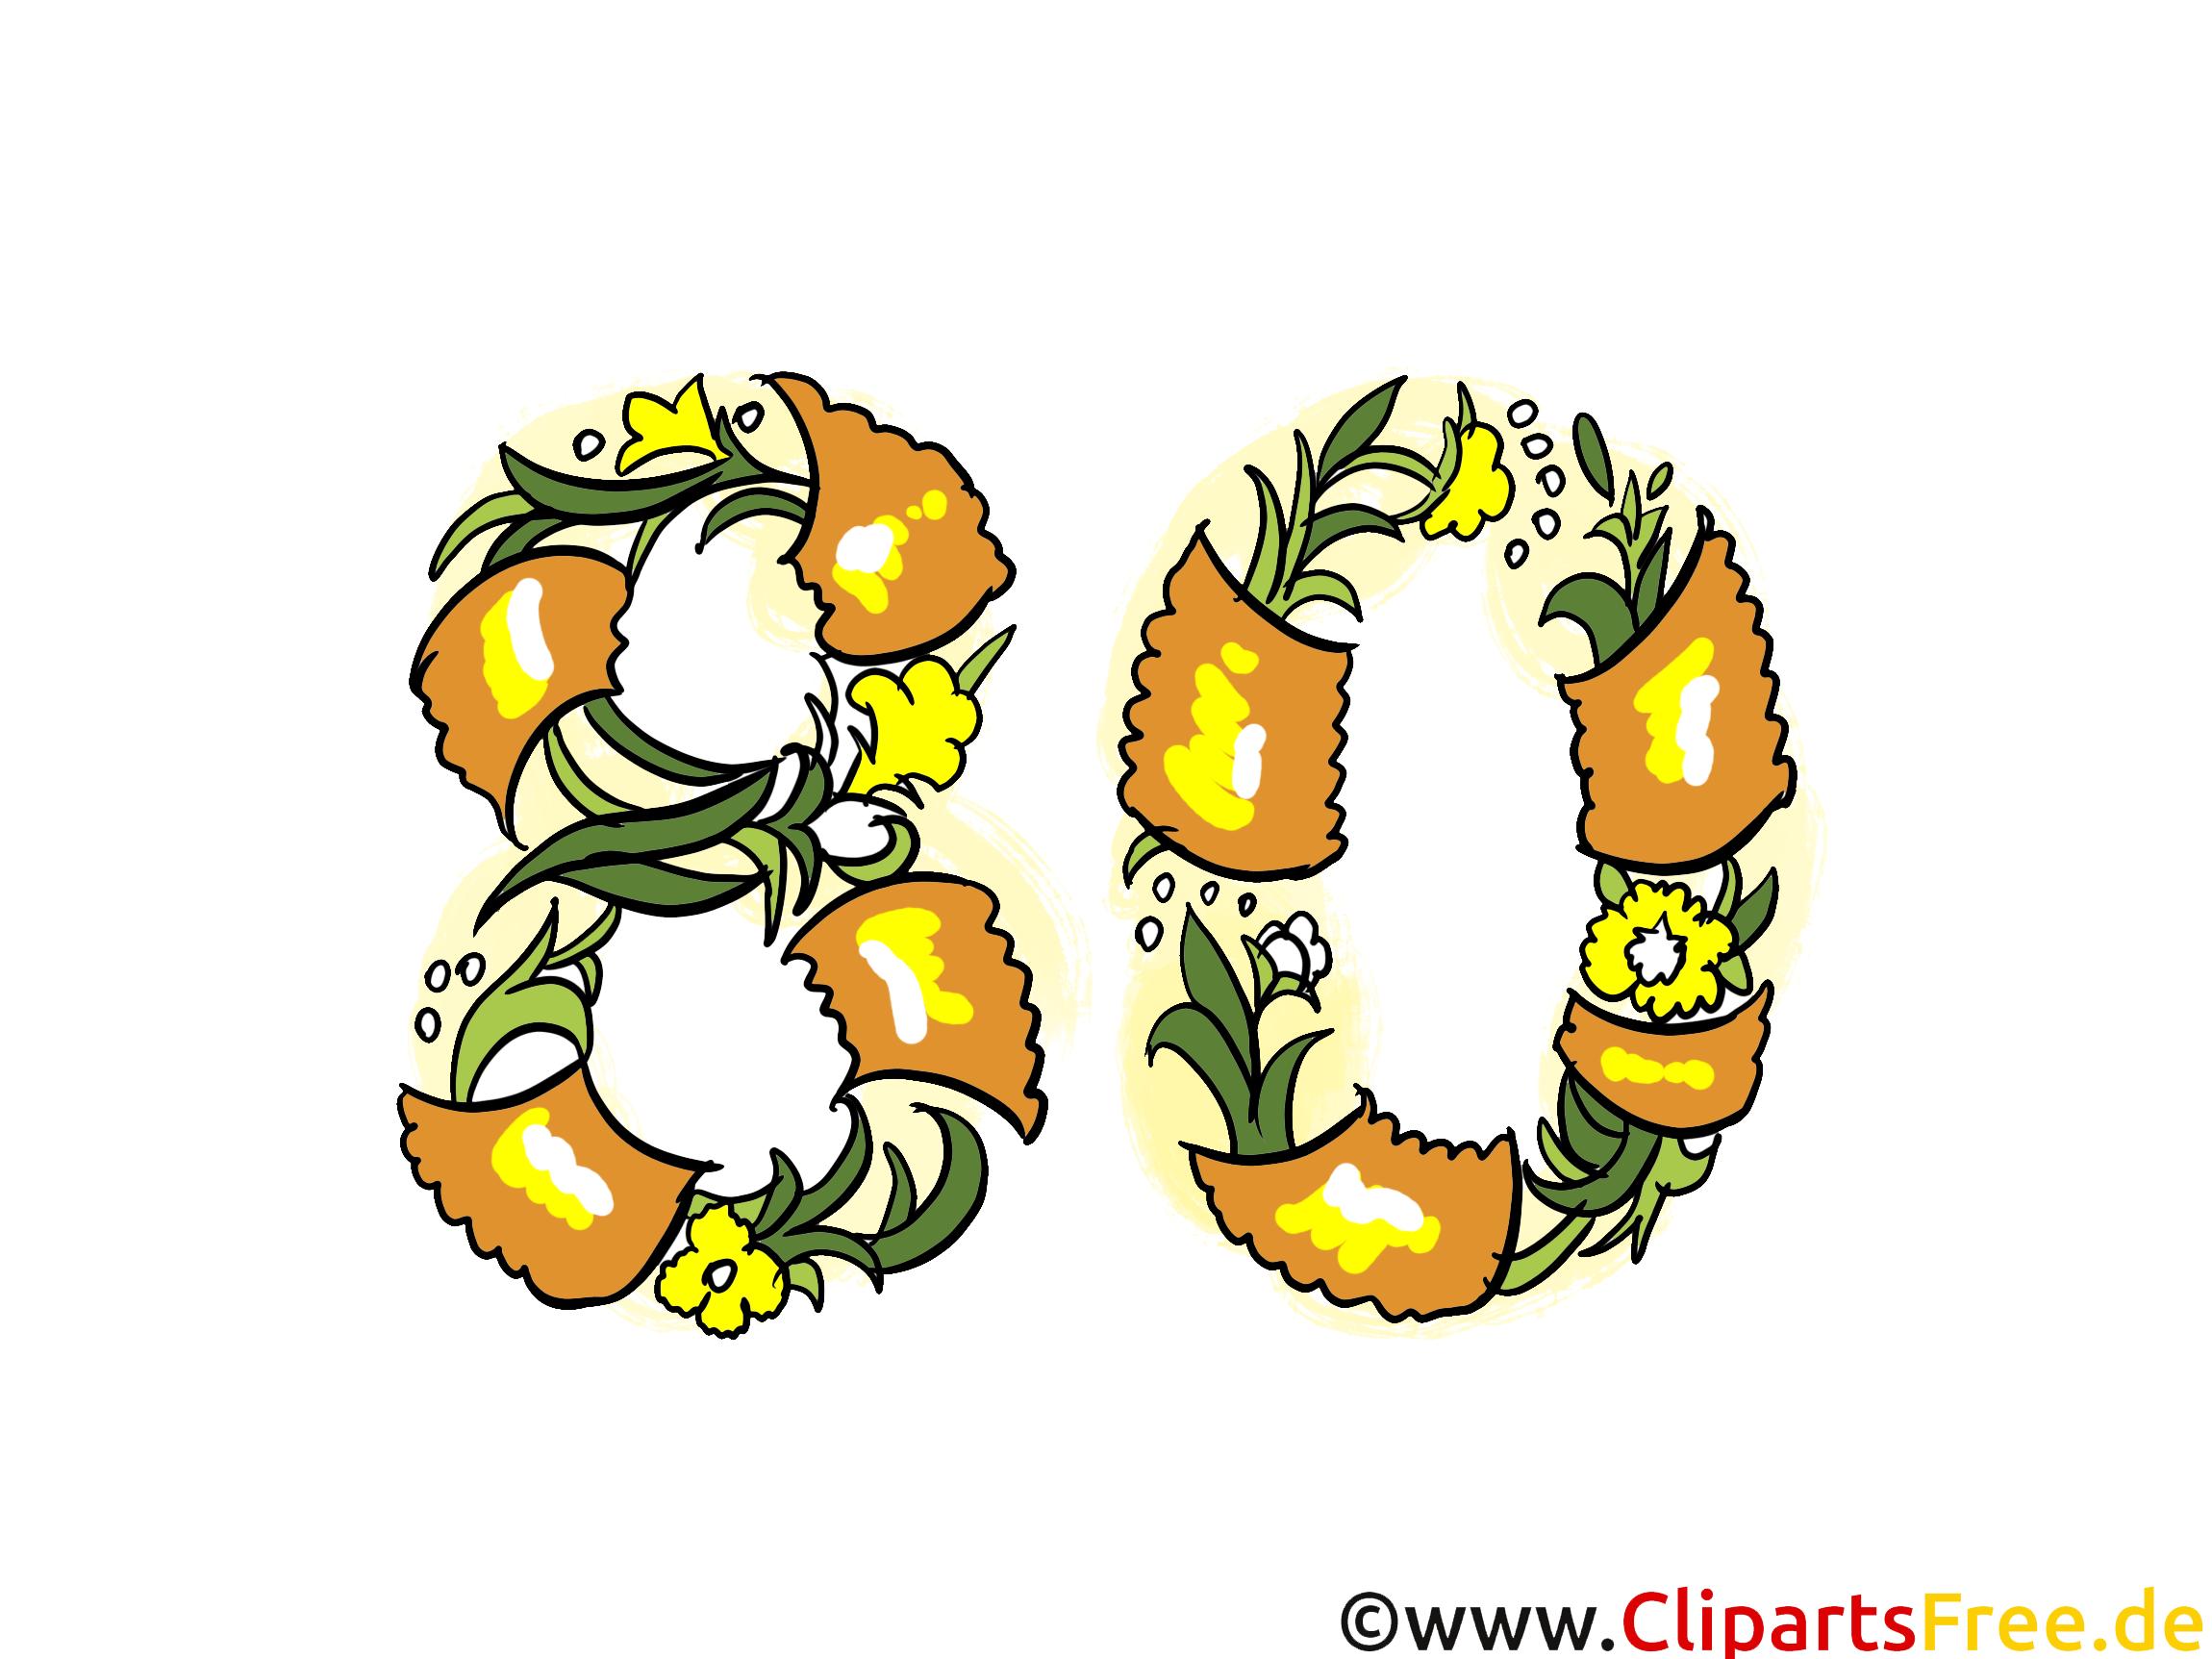 Gluckwunschkarte 80 Jahre Jubilaum Clipart Bild Ecard Grafik